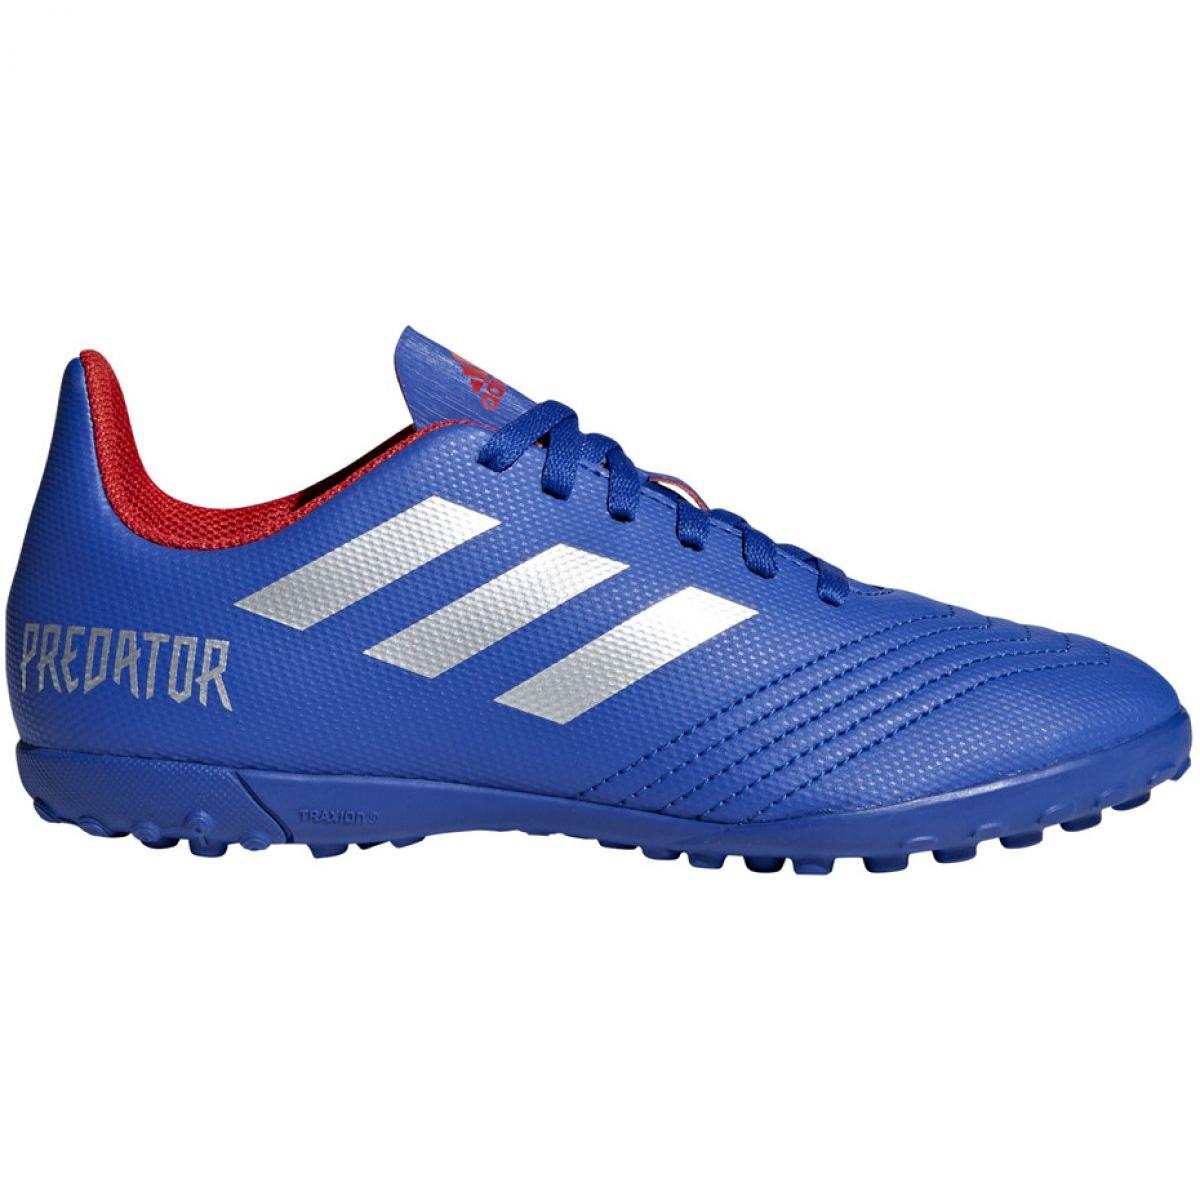 Adidas Predator 19.4 Tf Jr CM8556 futballcipő kék kék